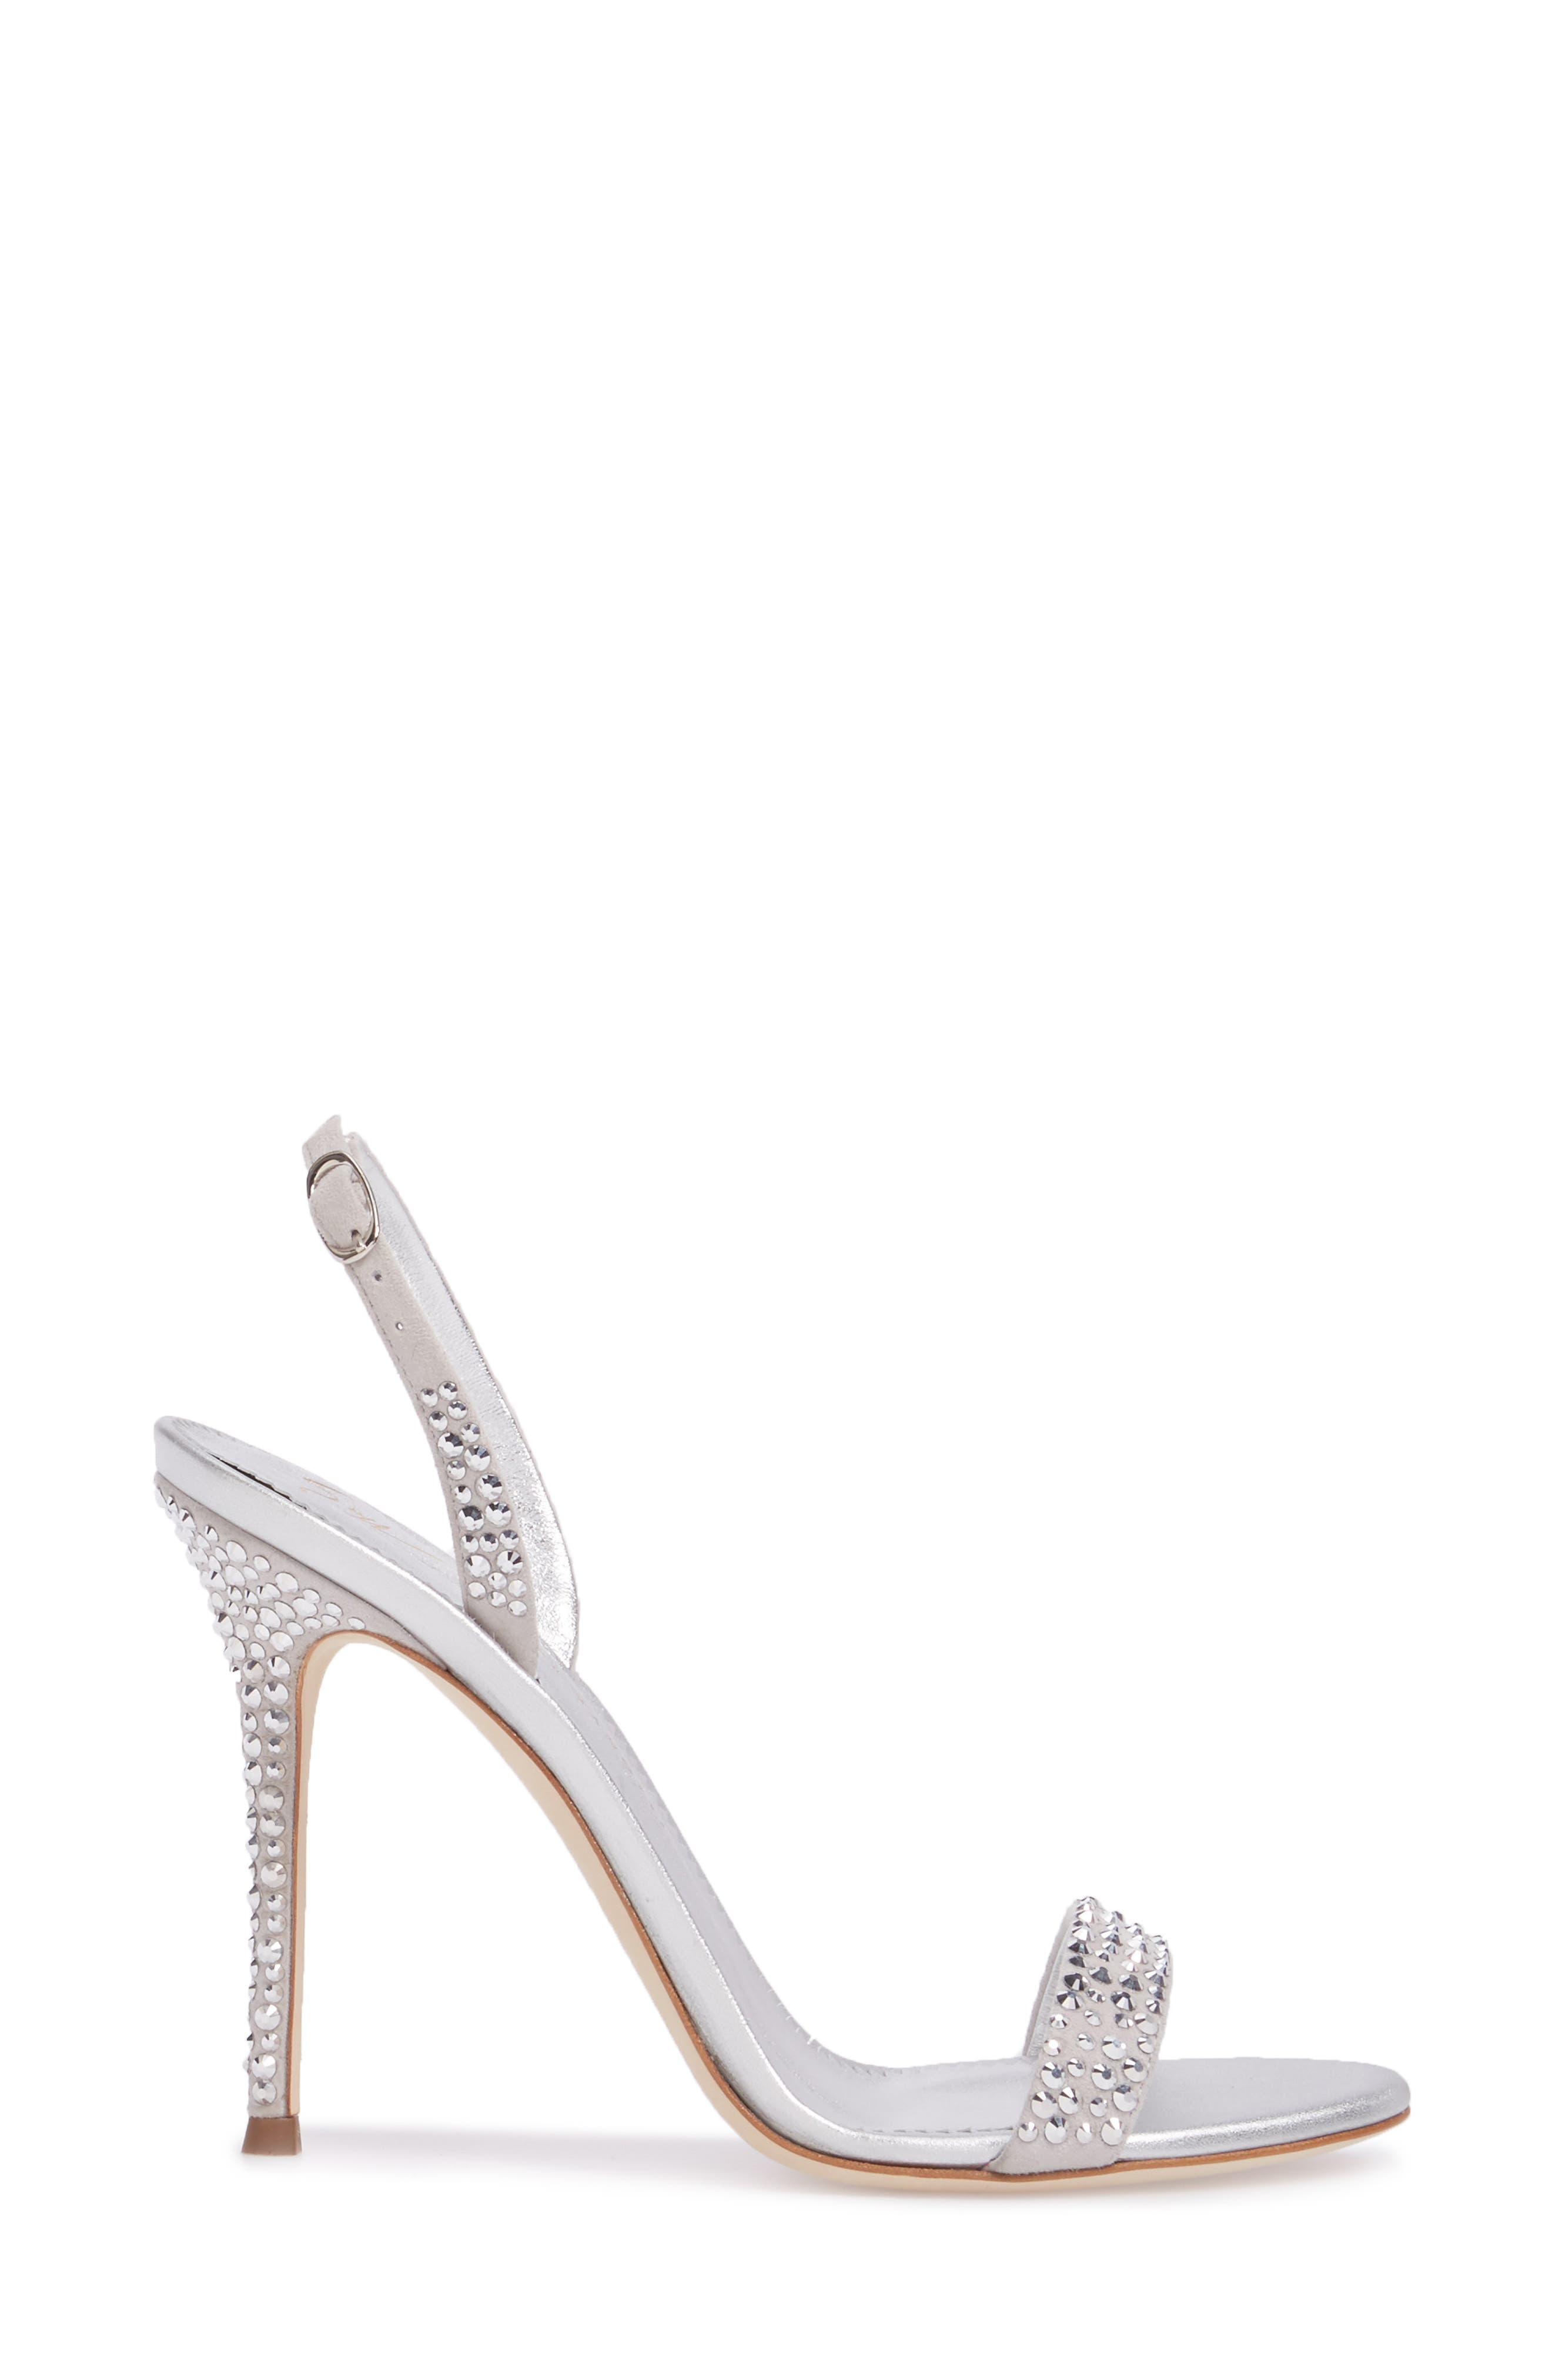 Musitco Crystal Embellished Slingback Sandal,                             Alternate thumbnail 3, color,                             Grey